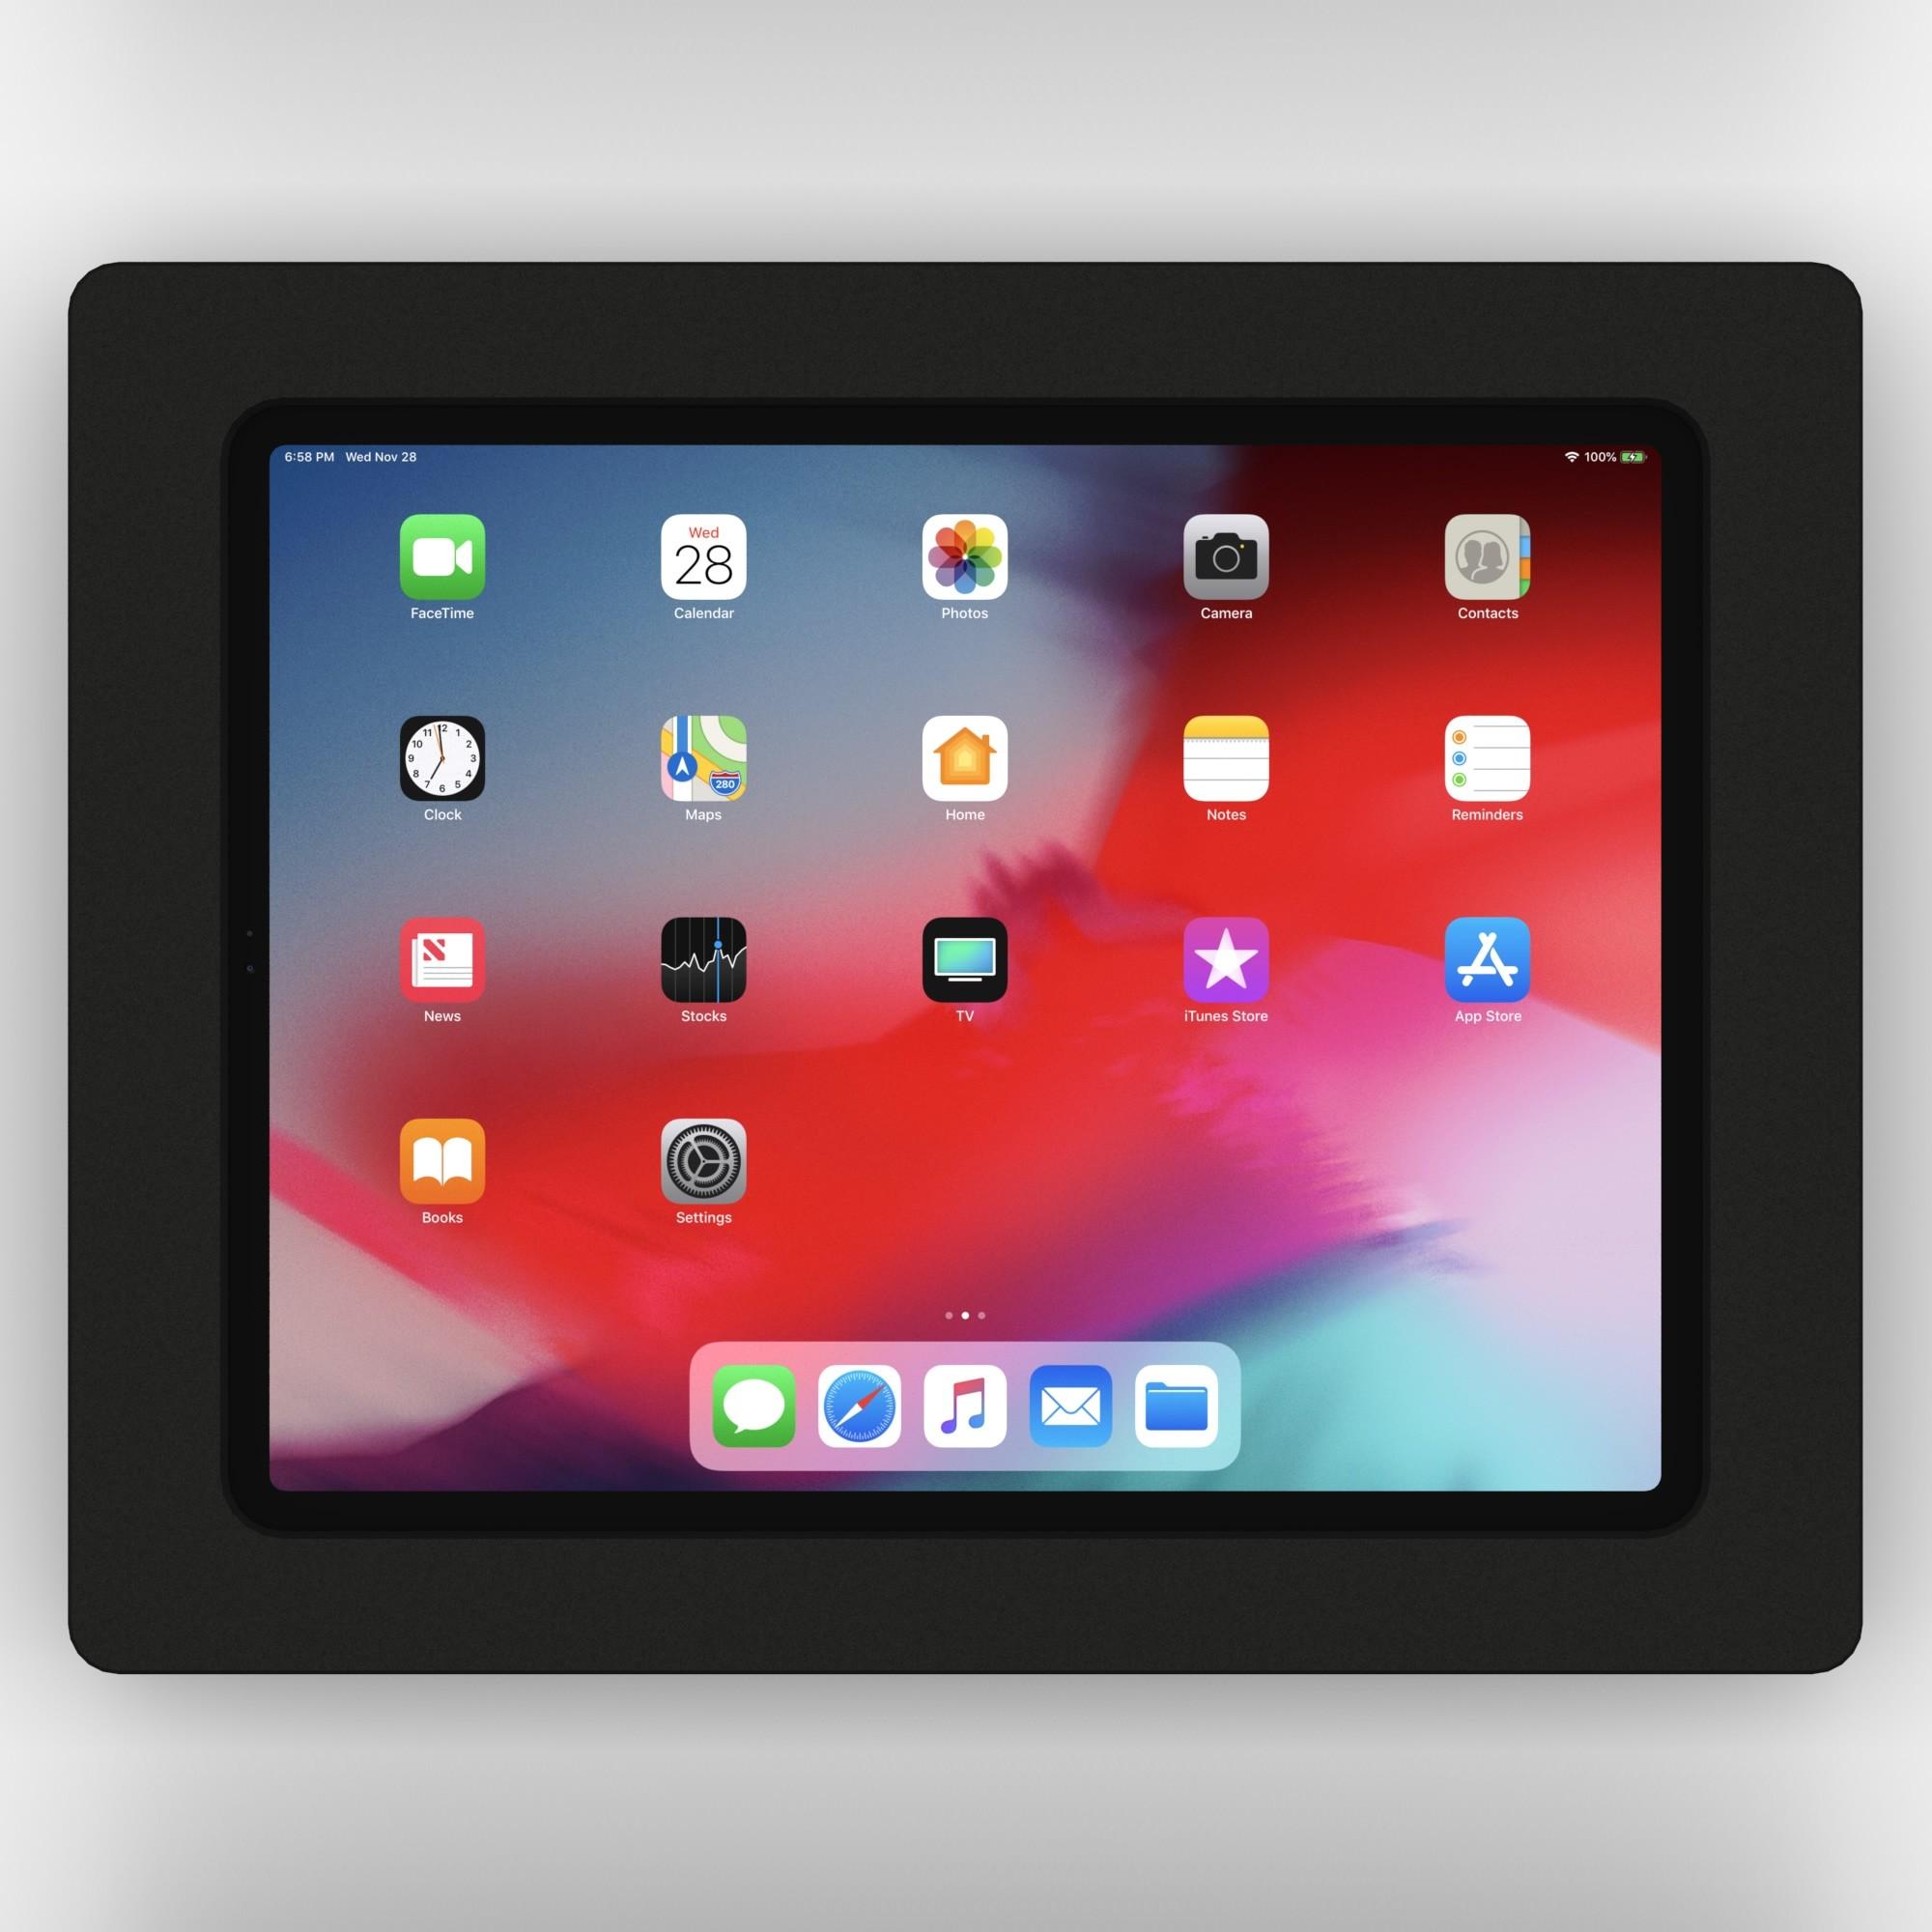 Fixed Slim Wall 12 9 Inch Ipad Pro 3rd Gen Tablet Mount